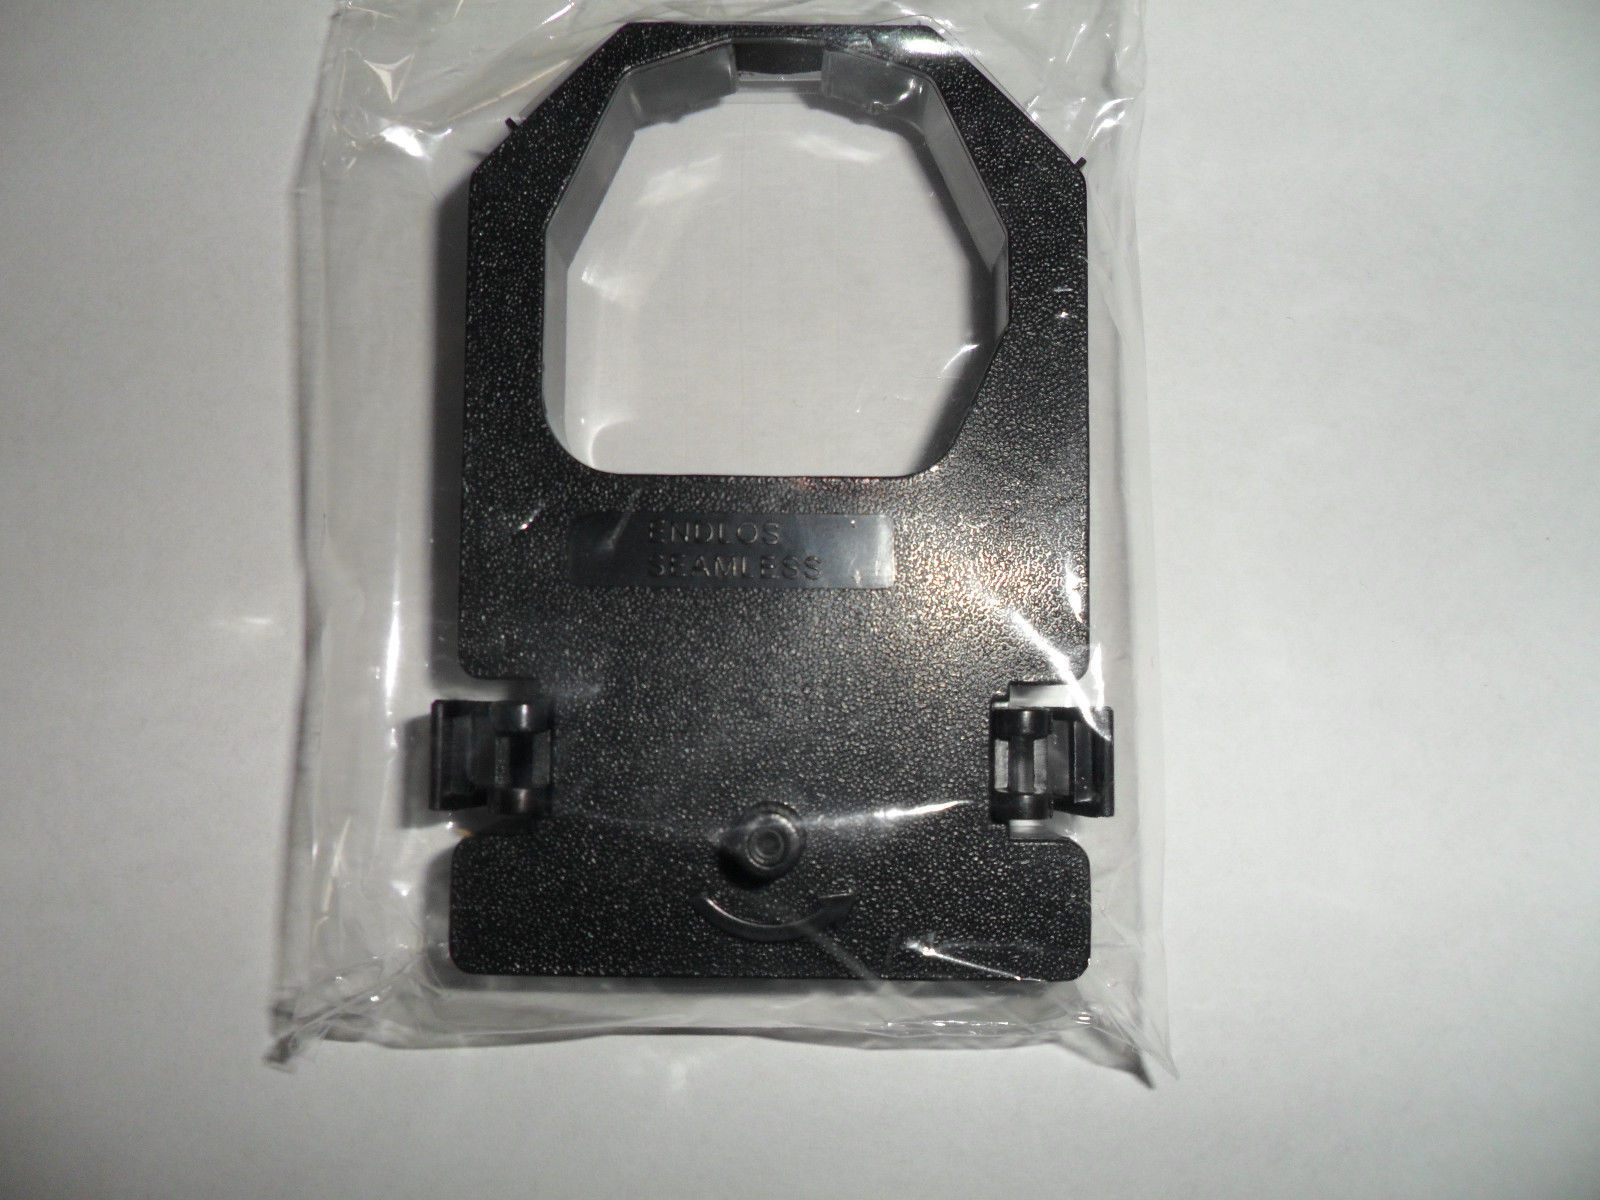 Wincor Nixdorf A721/A756/A758 Printer Ribbon Black (6 Pack)